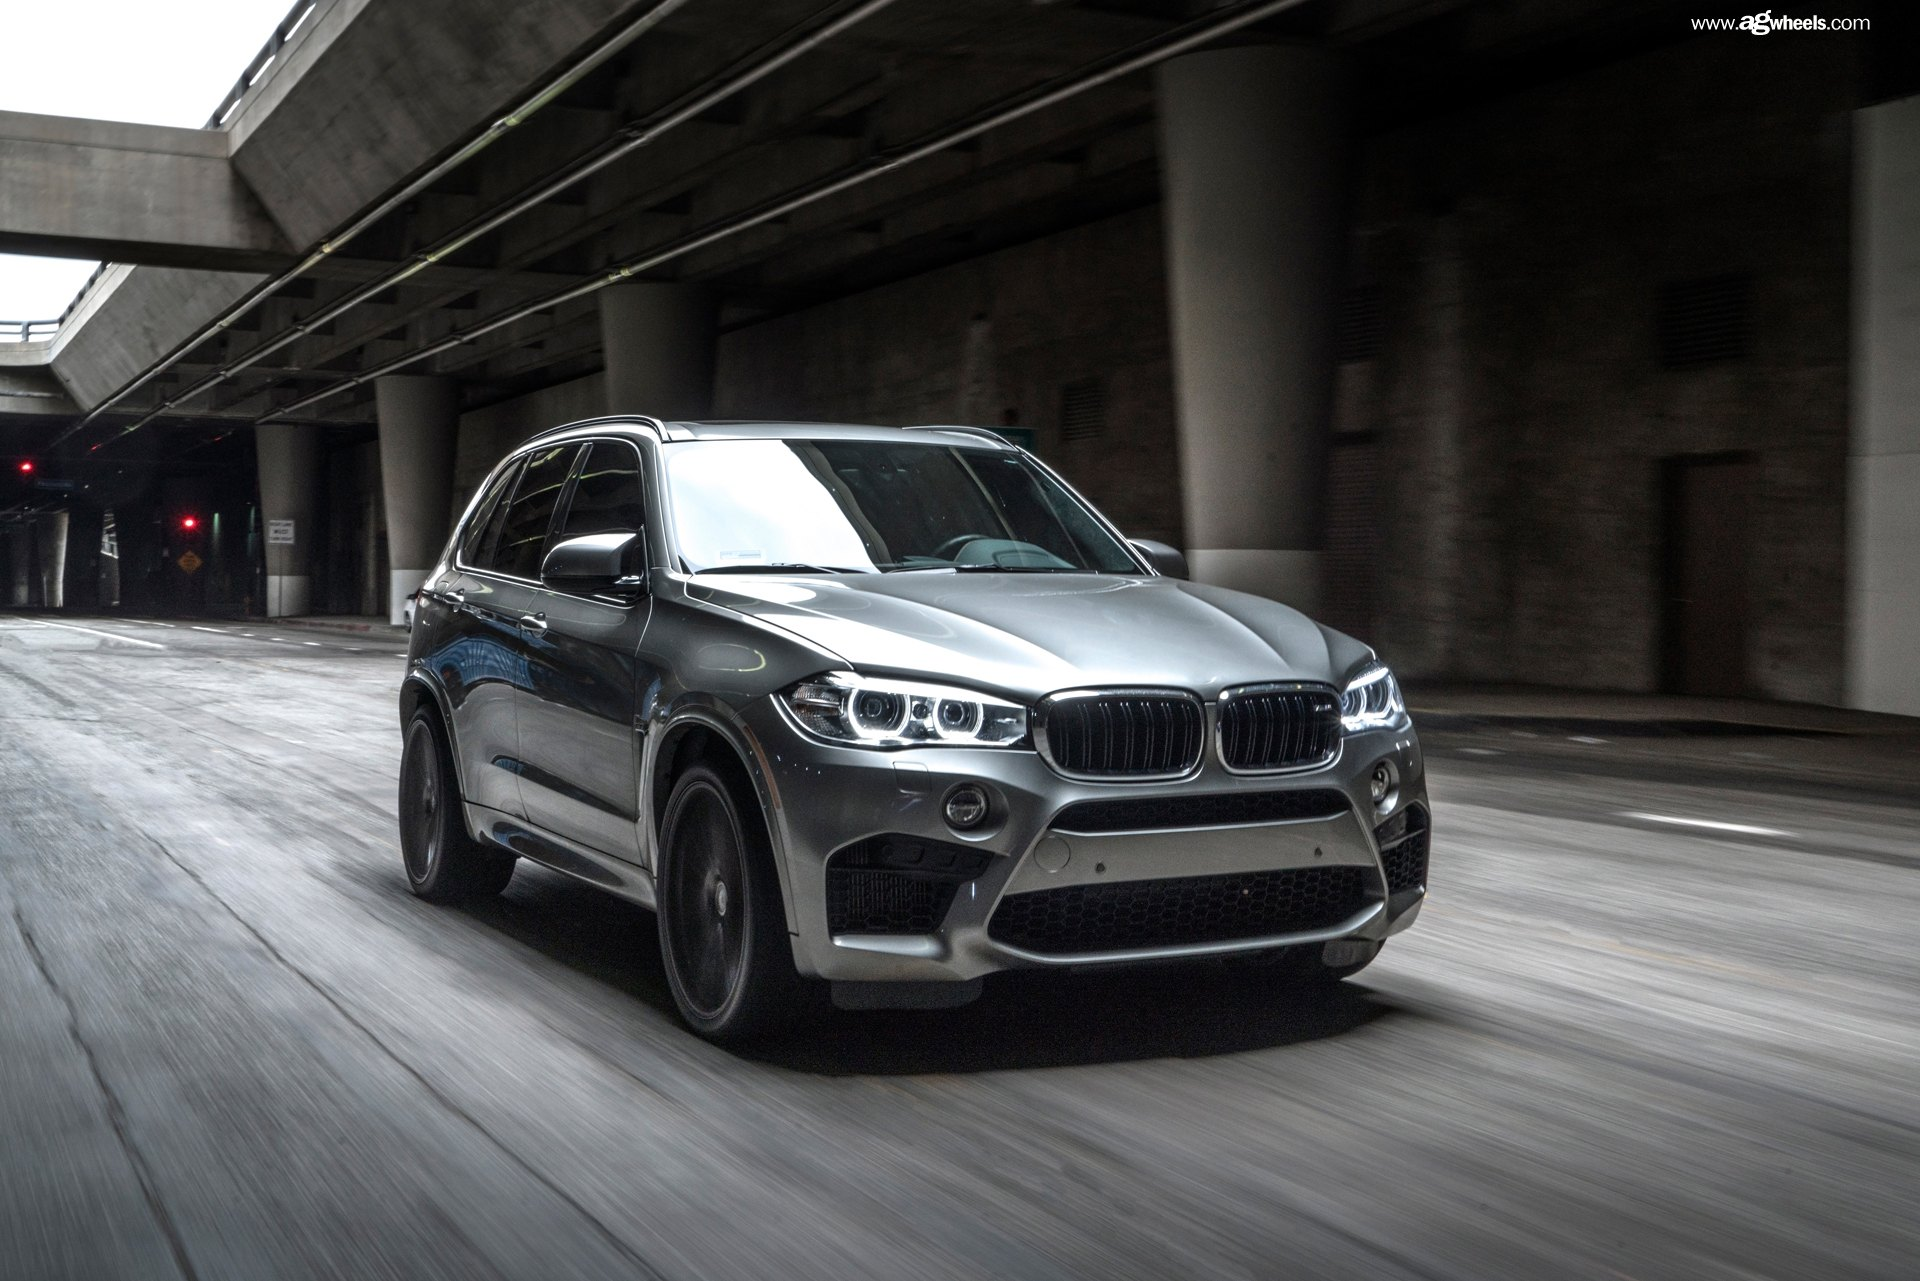 Silver BMW X5 With Custom Halo Headlights